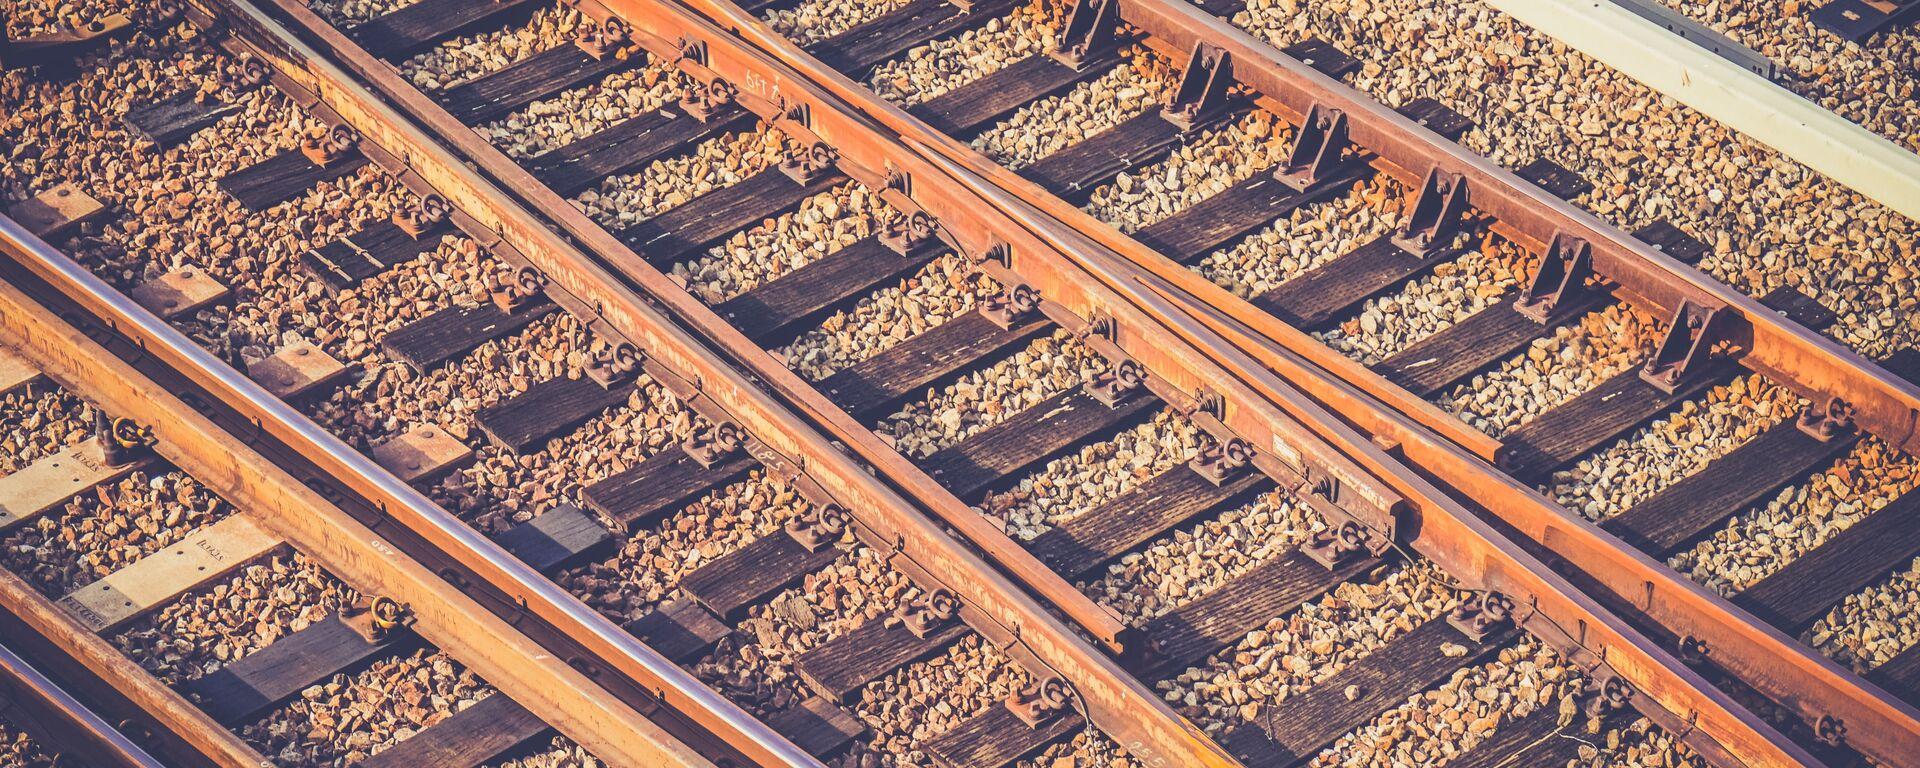 Ferrocarril (imagen referencial) - Sputnik Mundo, 1920, 17.07.2021